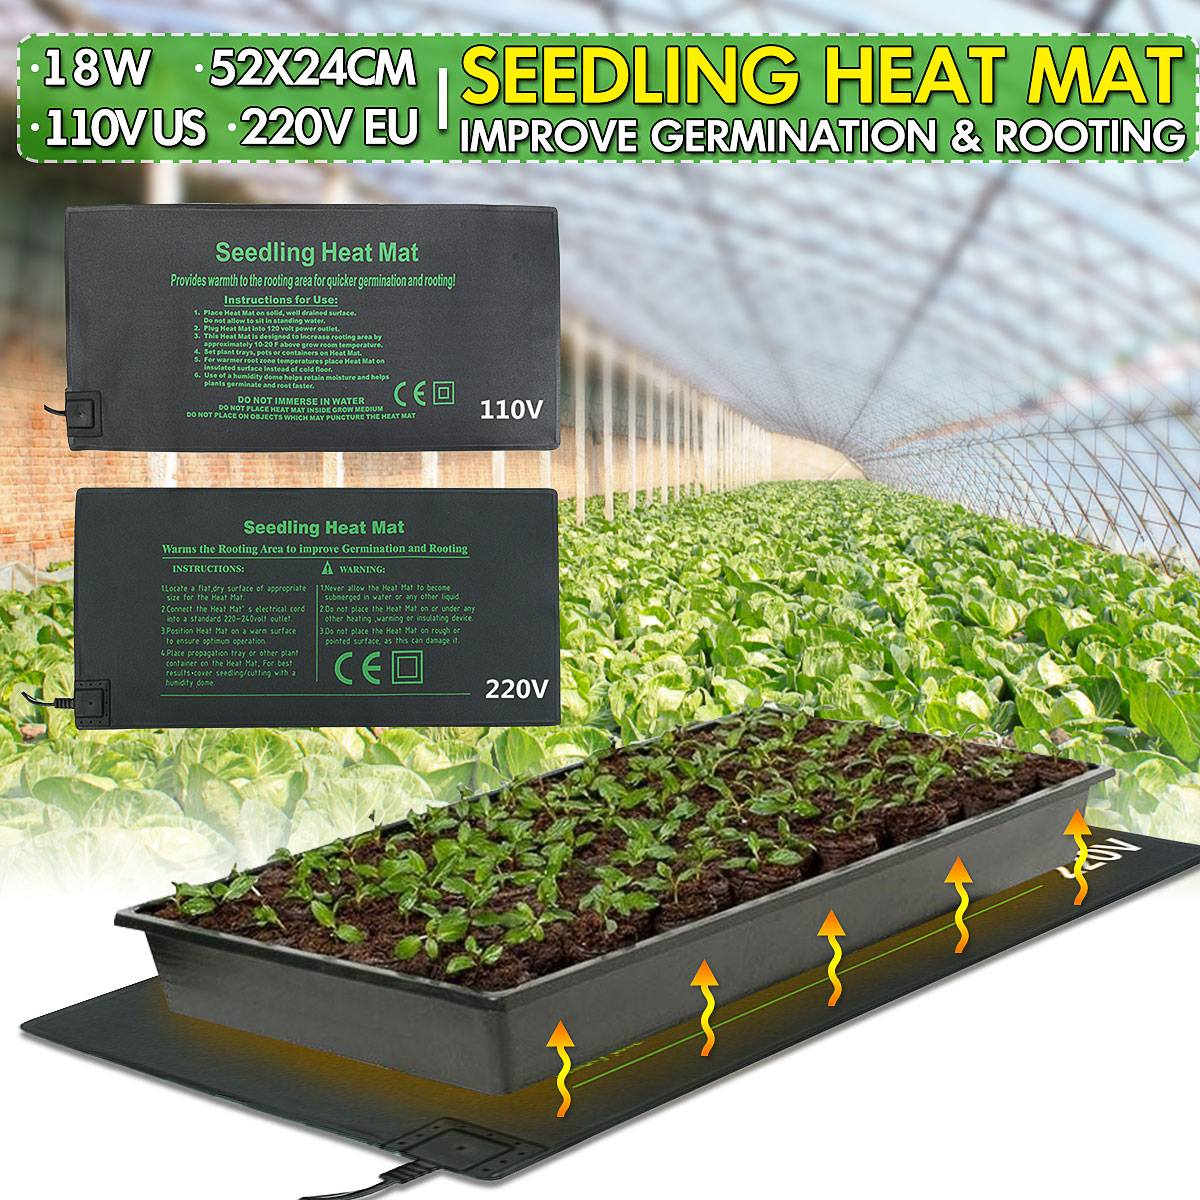 Seedling Heat Mat Plant Seed Germination Propagation Clone Starter Warm Pad Mat Vegetable Flowers Garden Tool Supplies 24x52cm